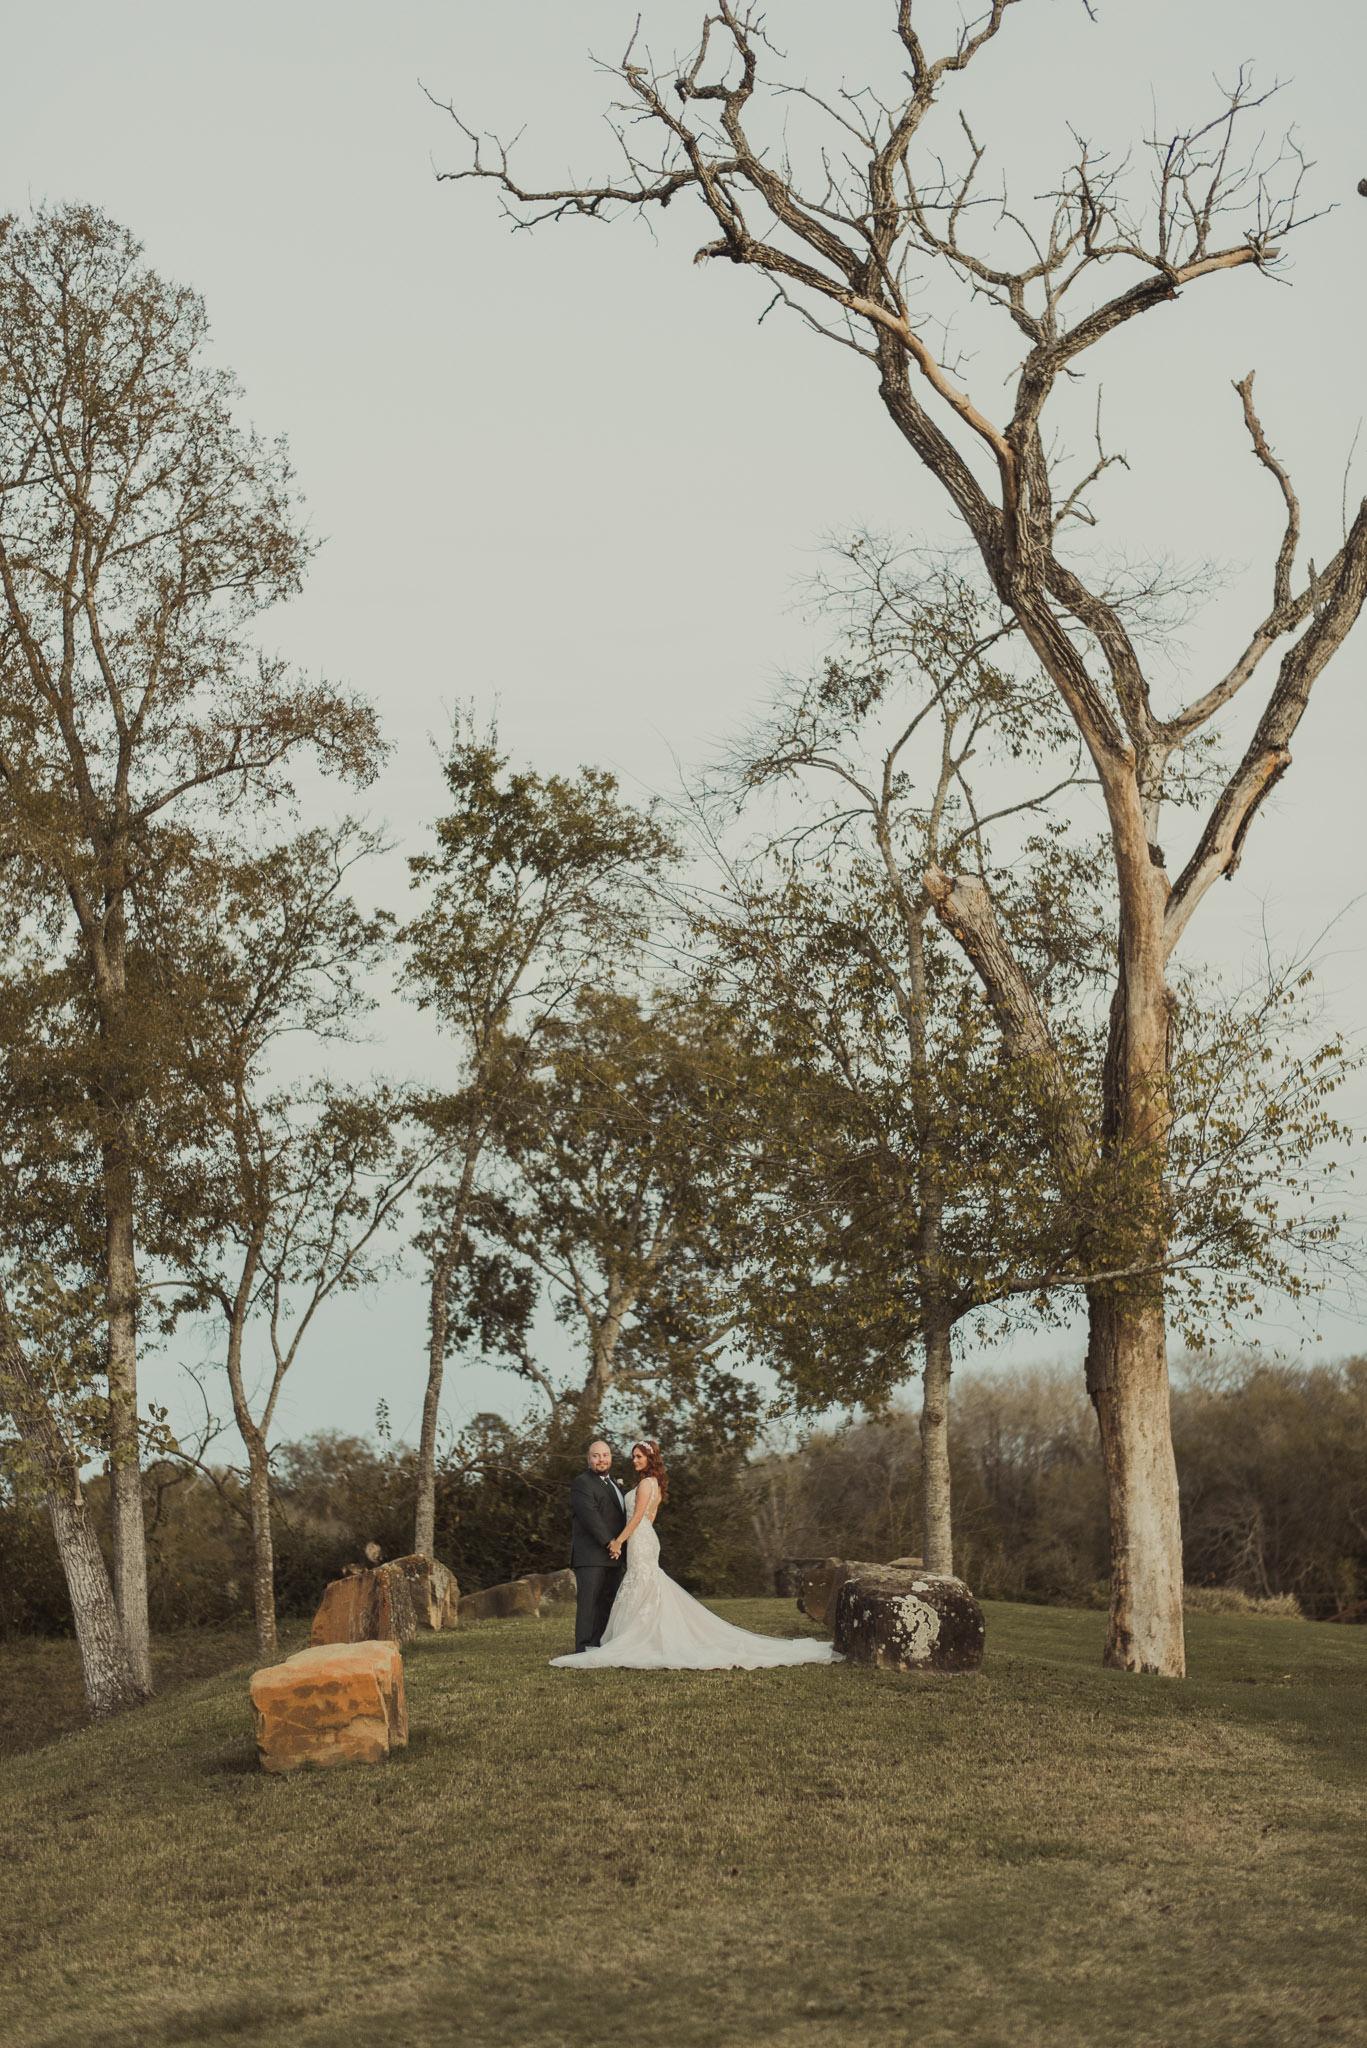 Cynthia-Curtis-Olde-Dobbine-Station-Houston-Wedding-Photographer-sm-83.jpg